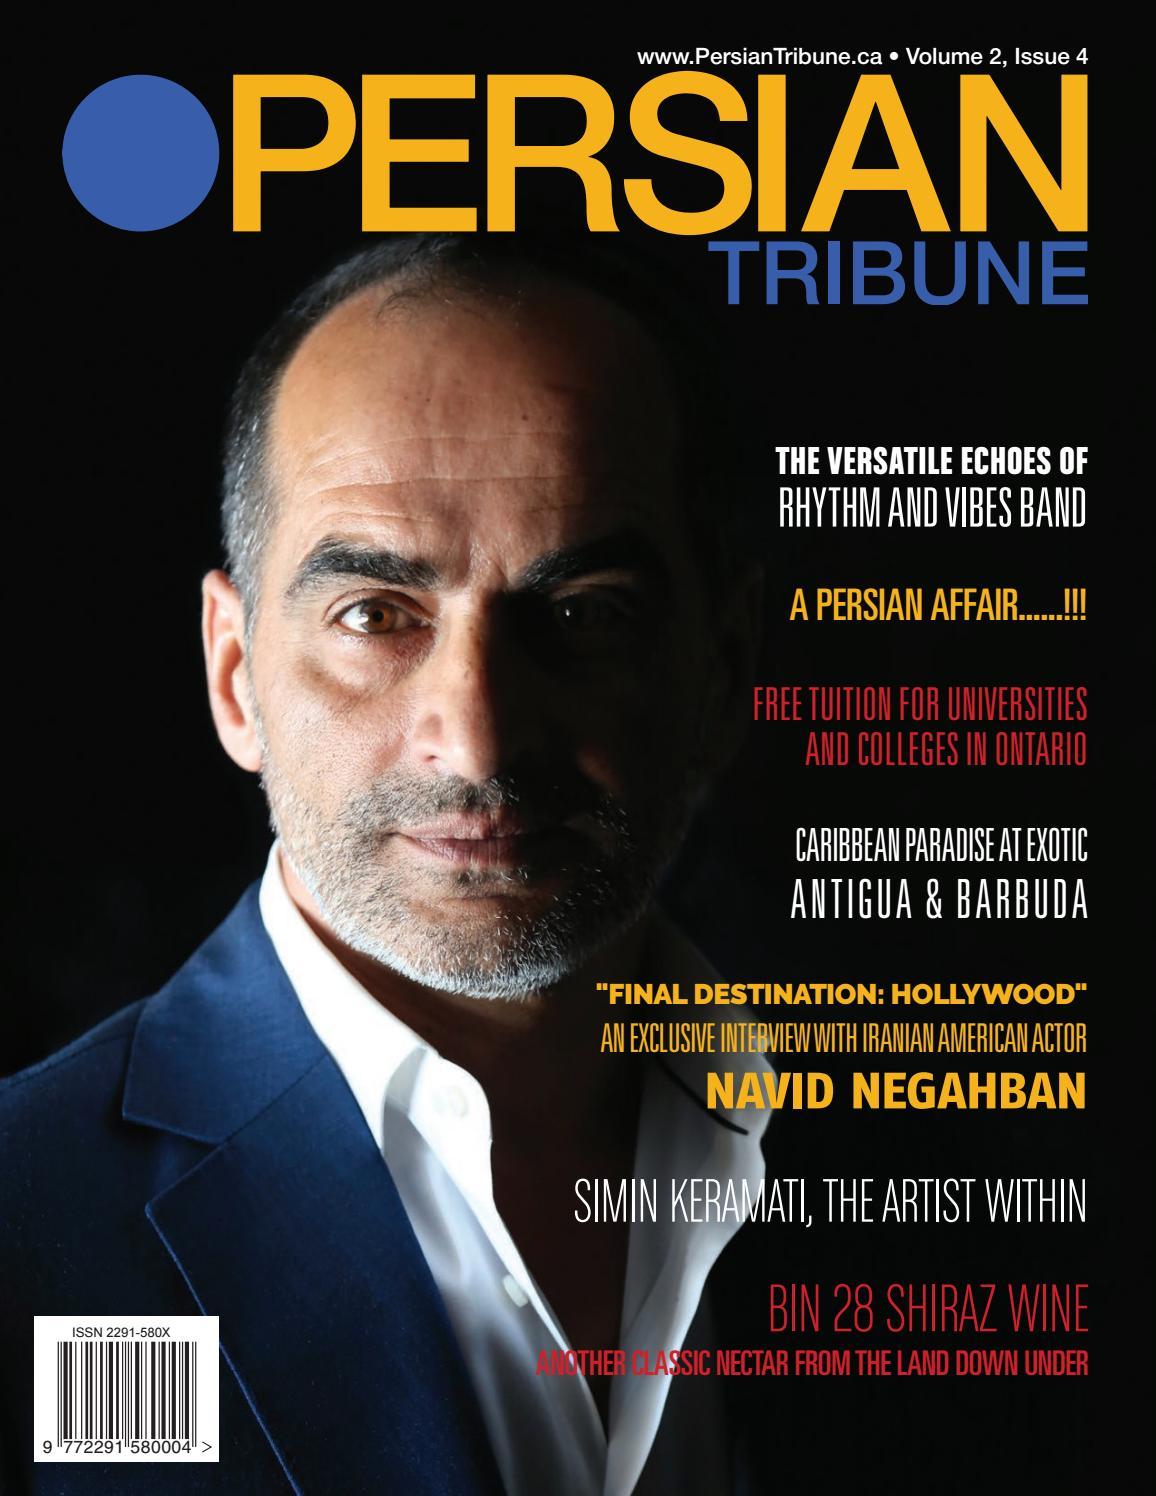 PERSIAN TRIBUNE Volume 2, Issue 4 by Persian Tribune - issuu